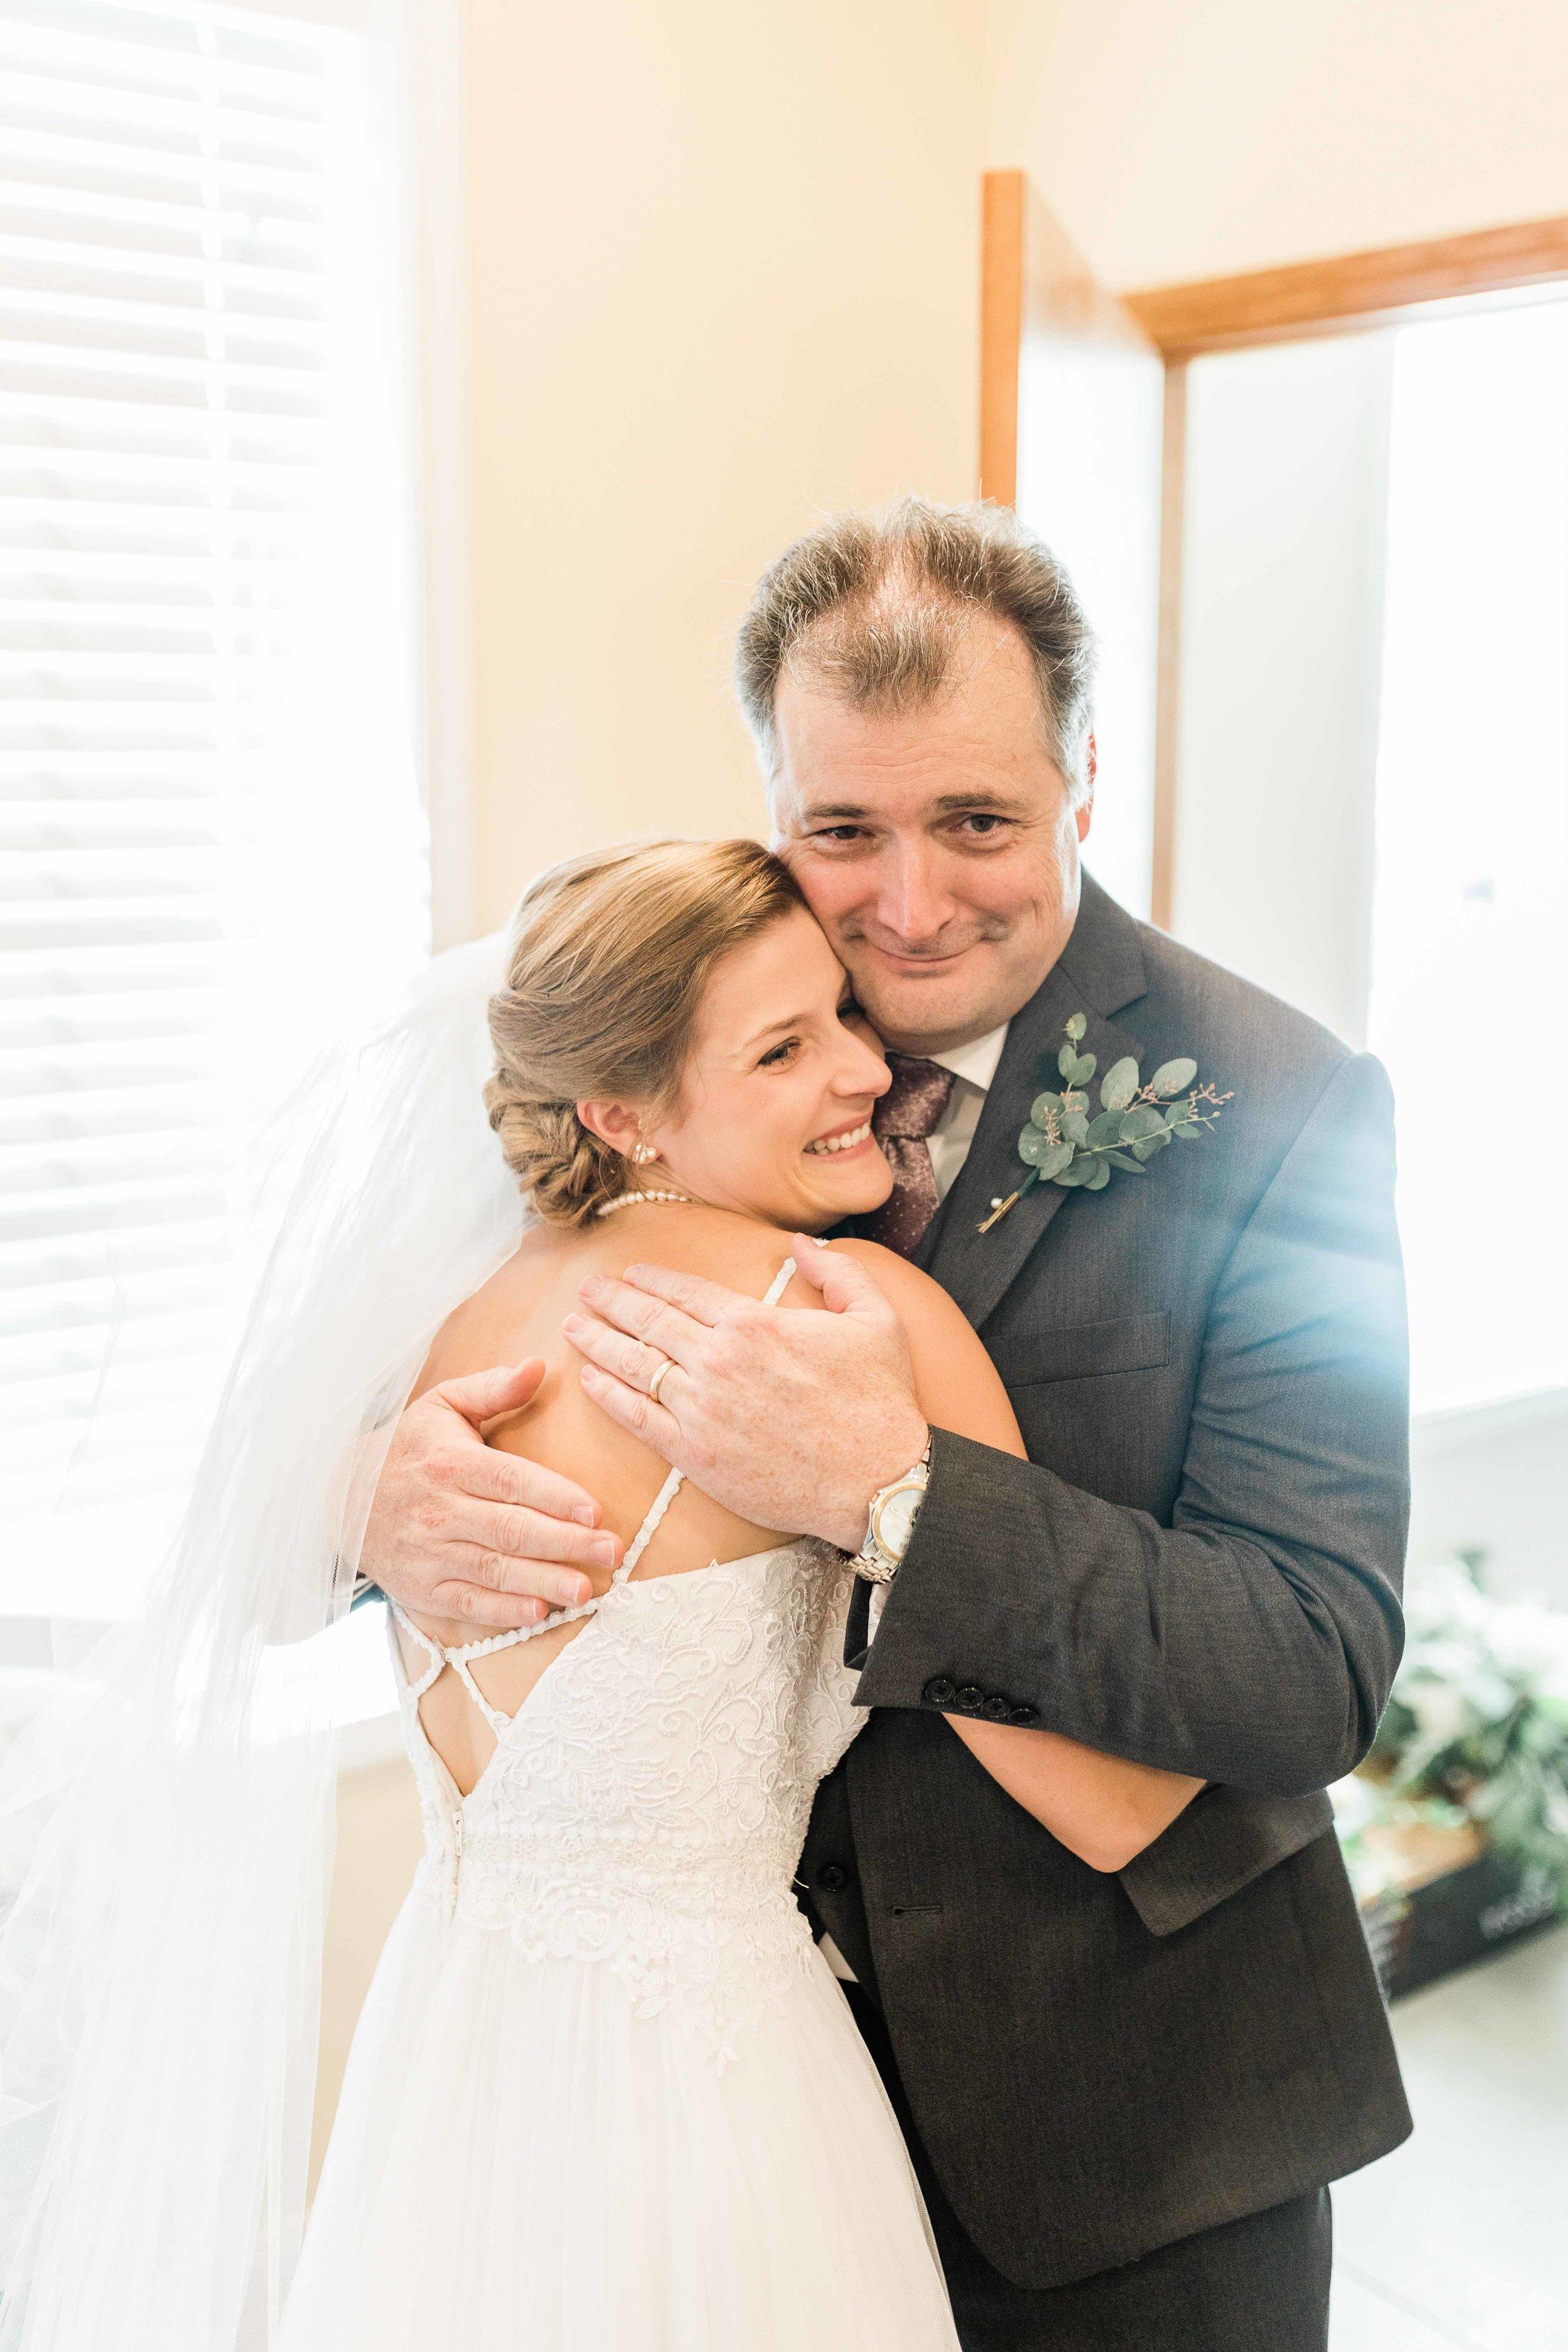 rosewood manor miamisburg wedding photographer-1.jpg